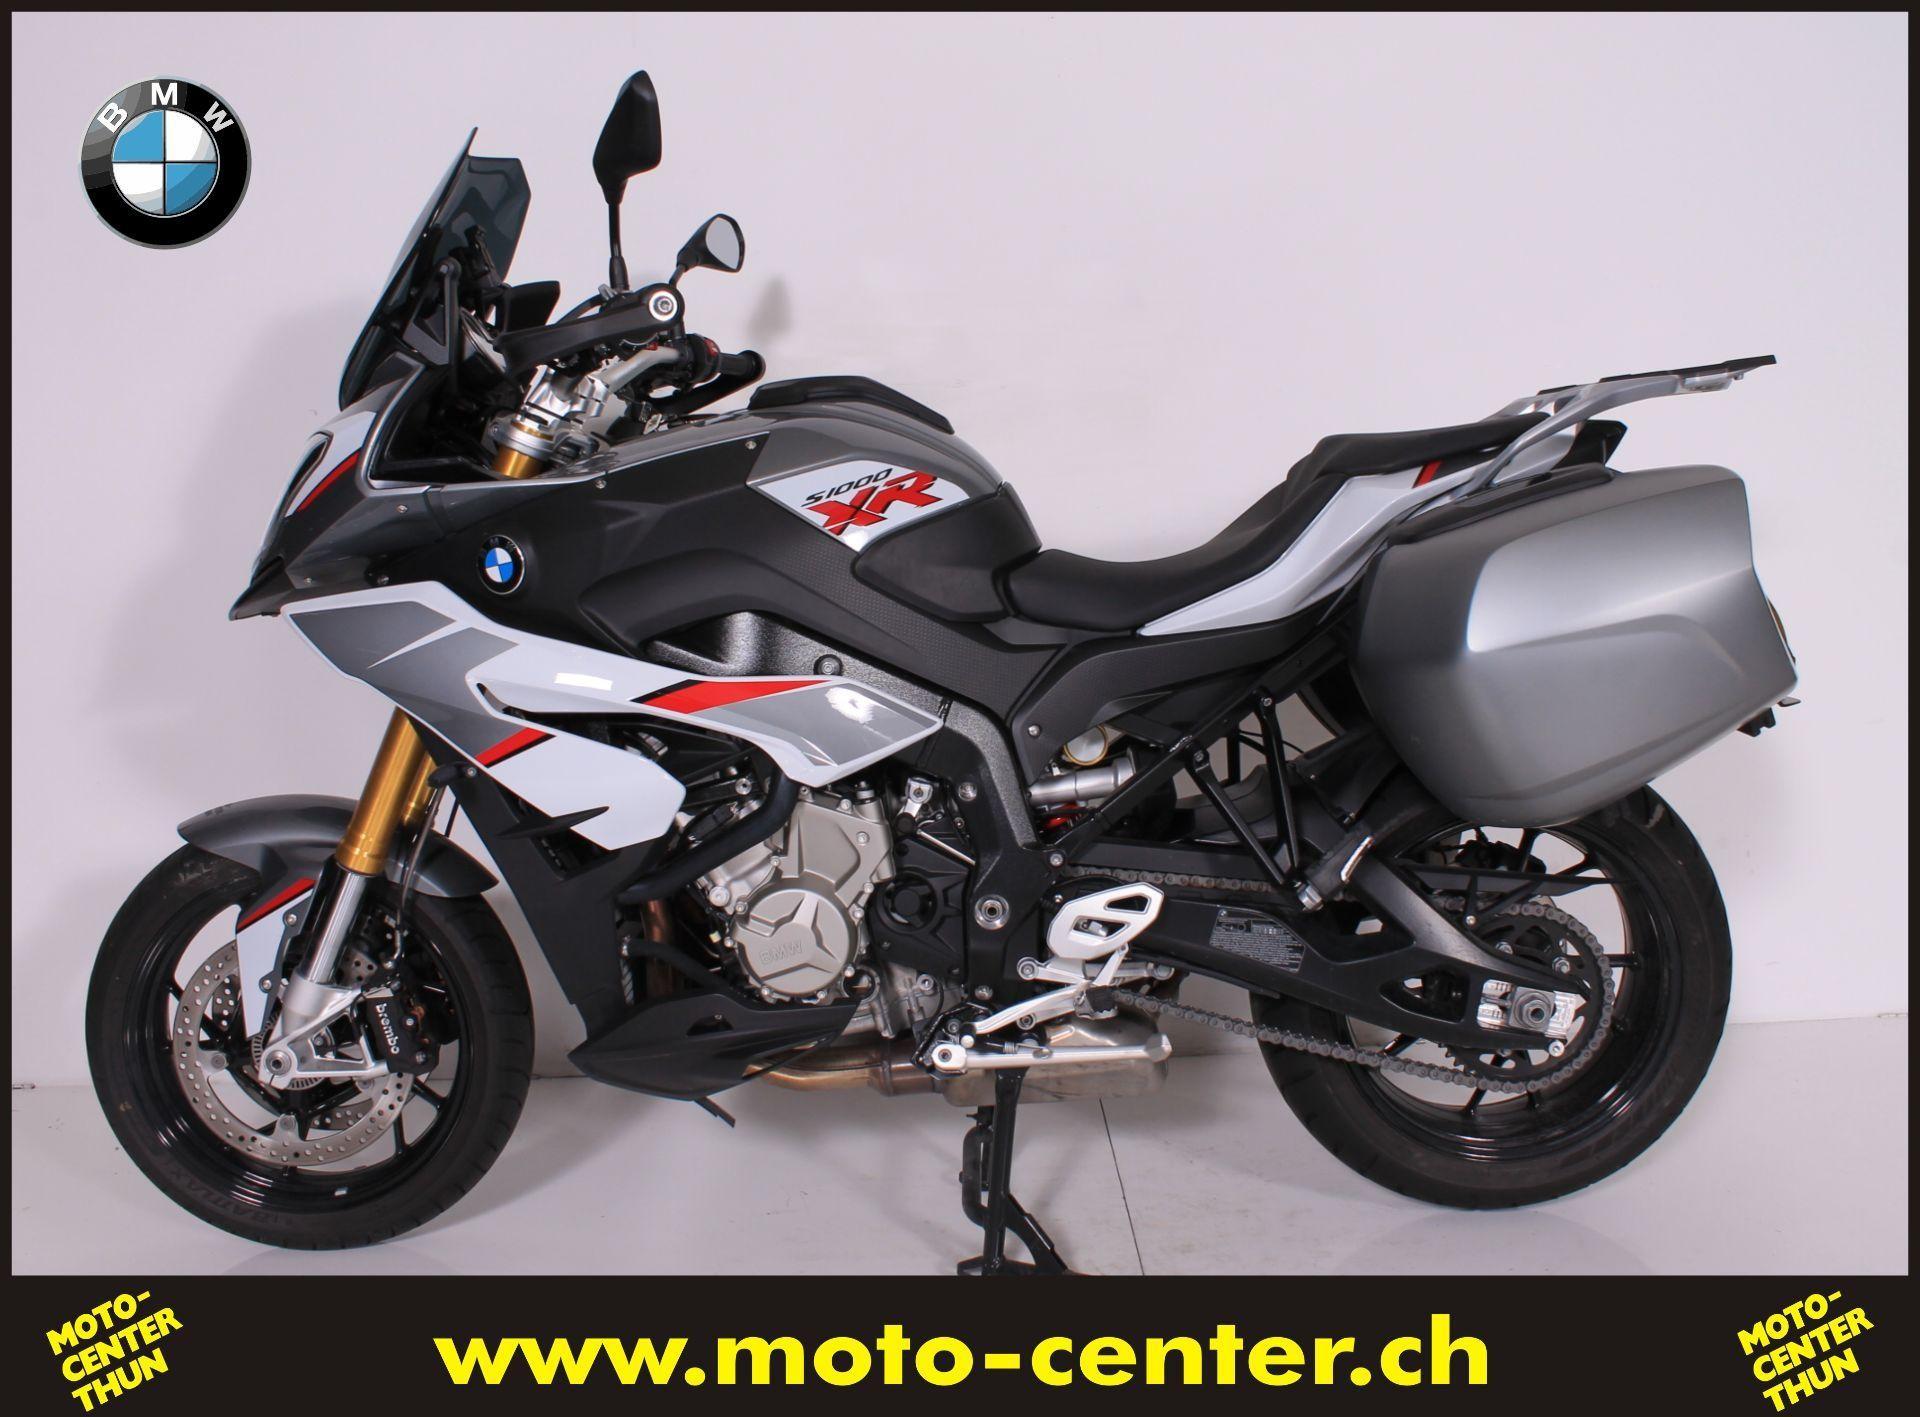 moto occasions acheter bmw s 1000 xr abs moto center thun steffisburg. Black Bedroom Furniture Sets. Home Design Ideas